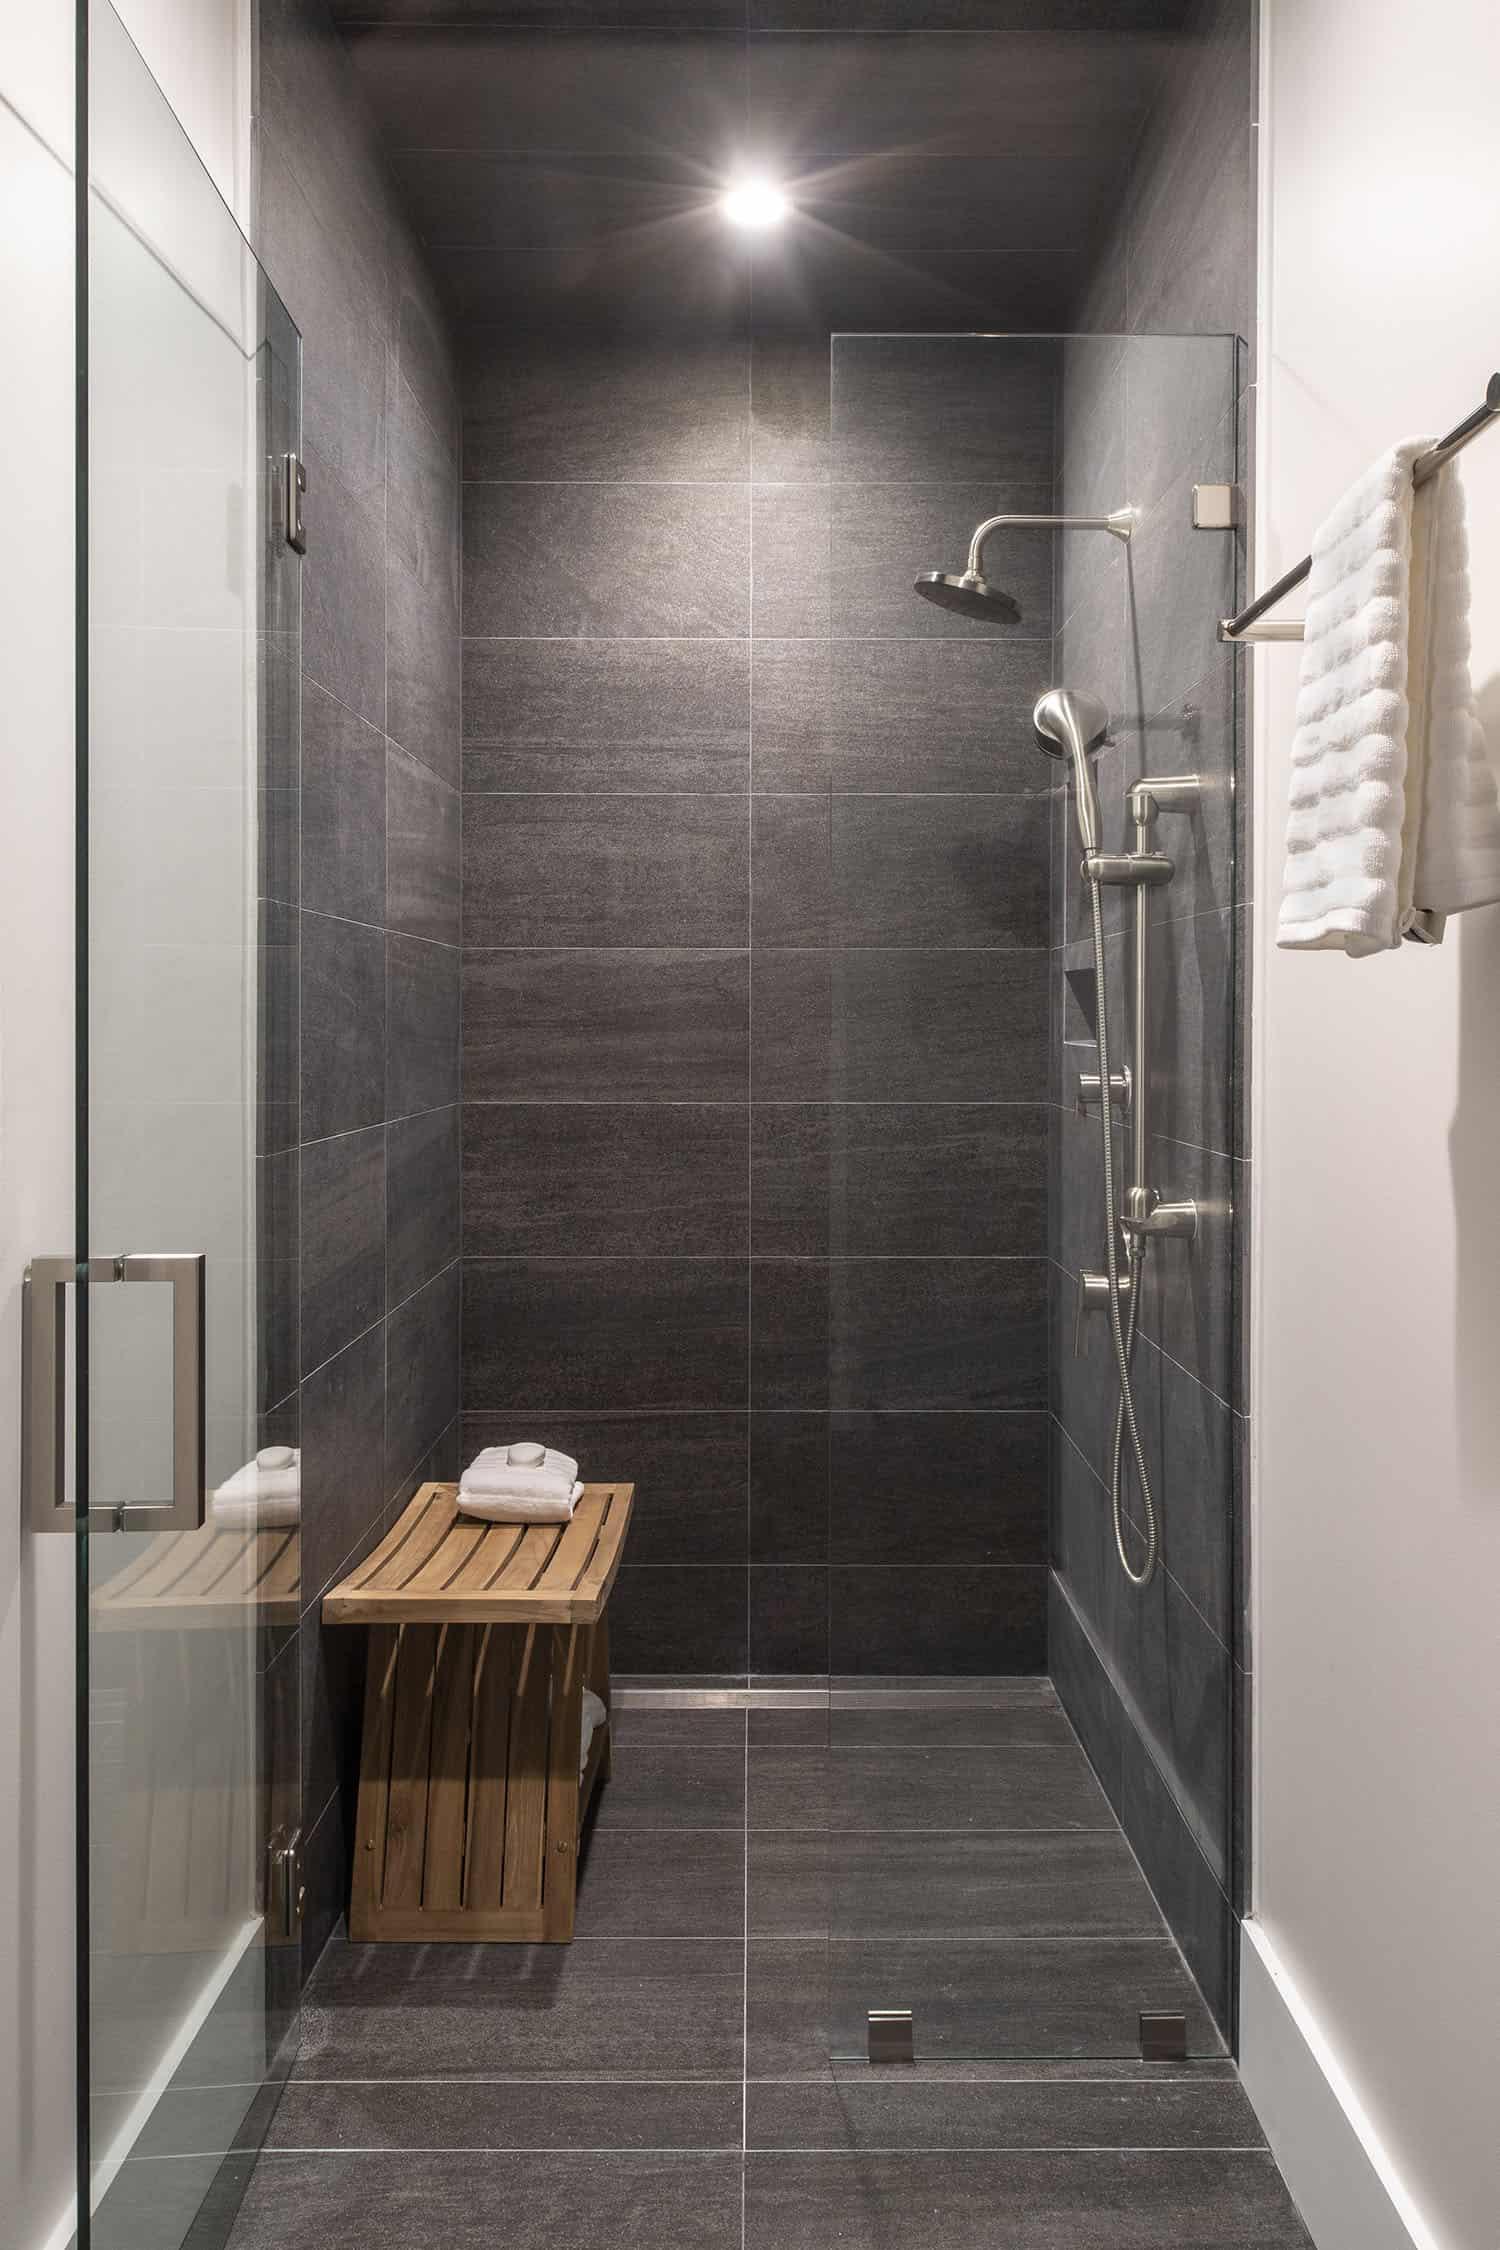 salle-de-bain-invité-salle-de-bain-contemporaine